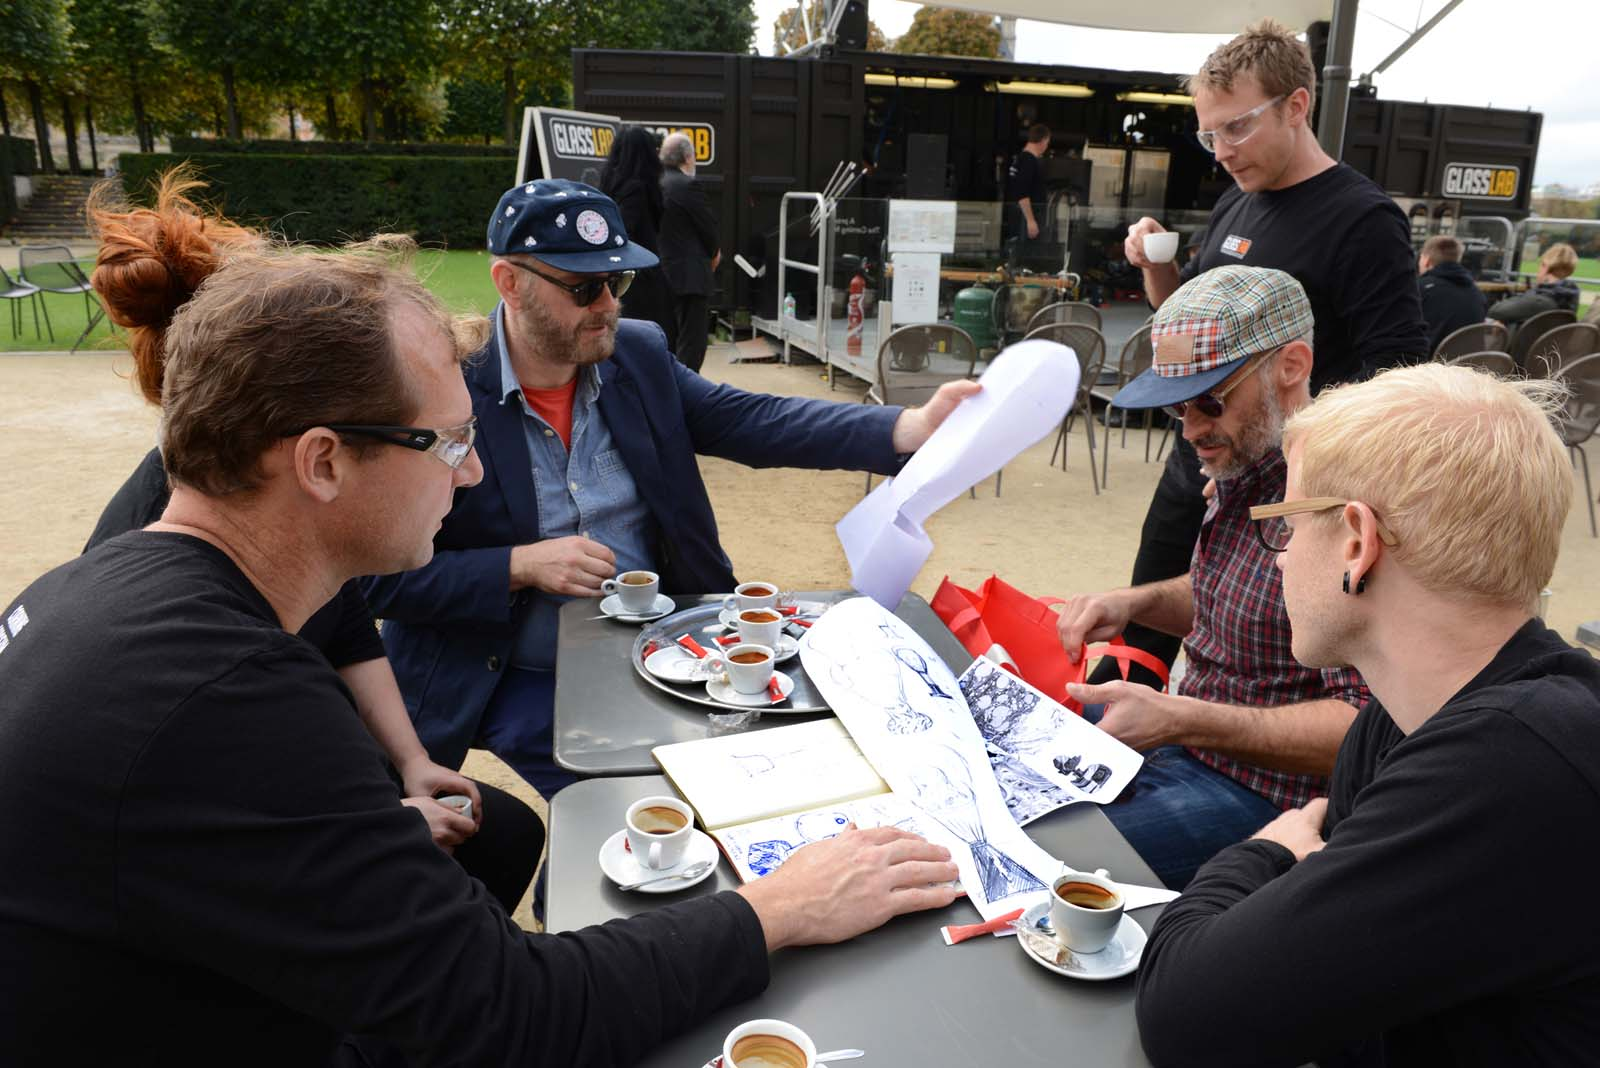 Designers Antoine Audiau and Manuel Warosz in a GlassLab design session in Paris, 2013. Photo credit Diedi.